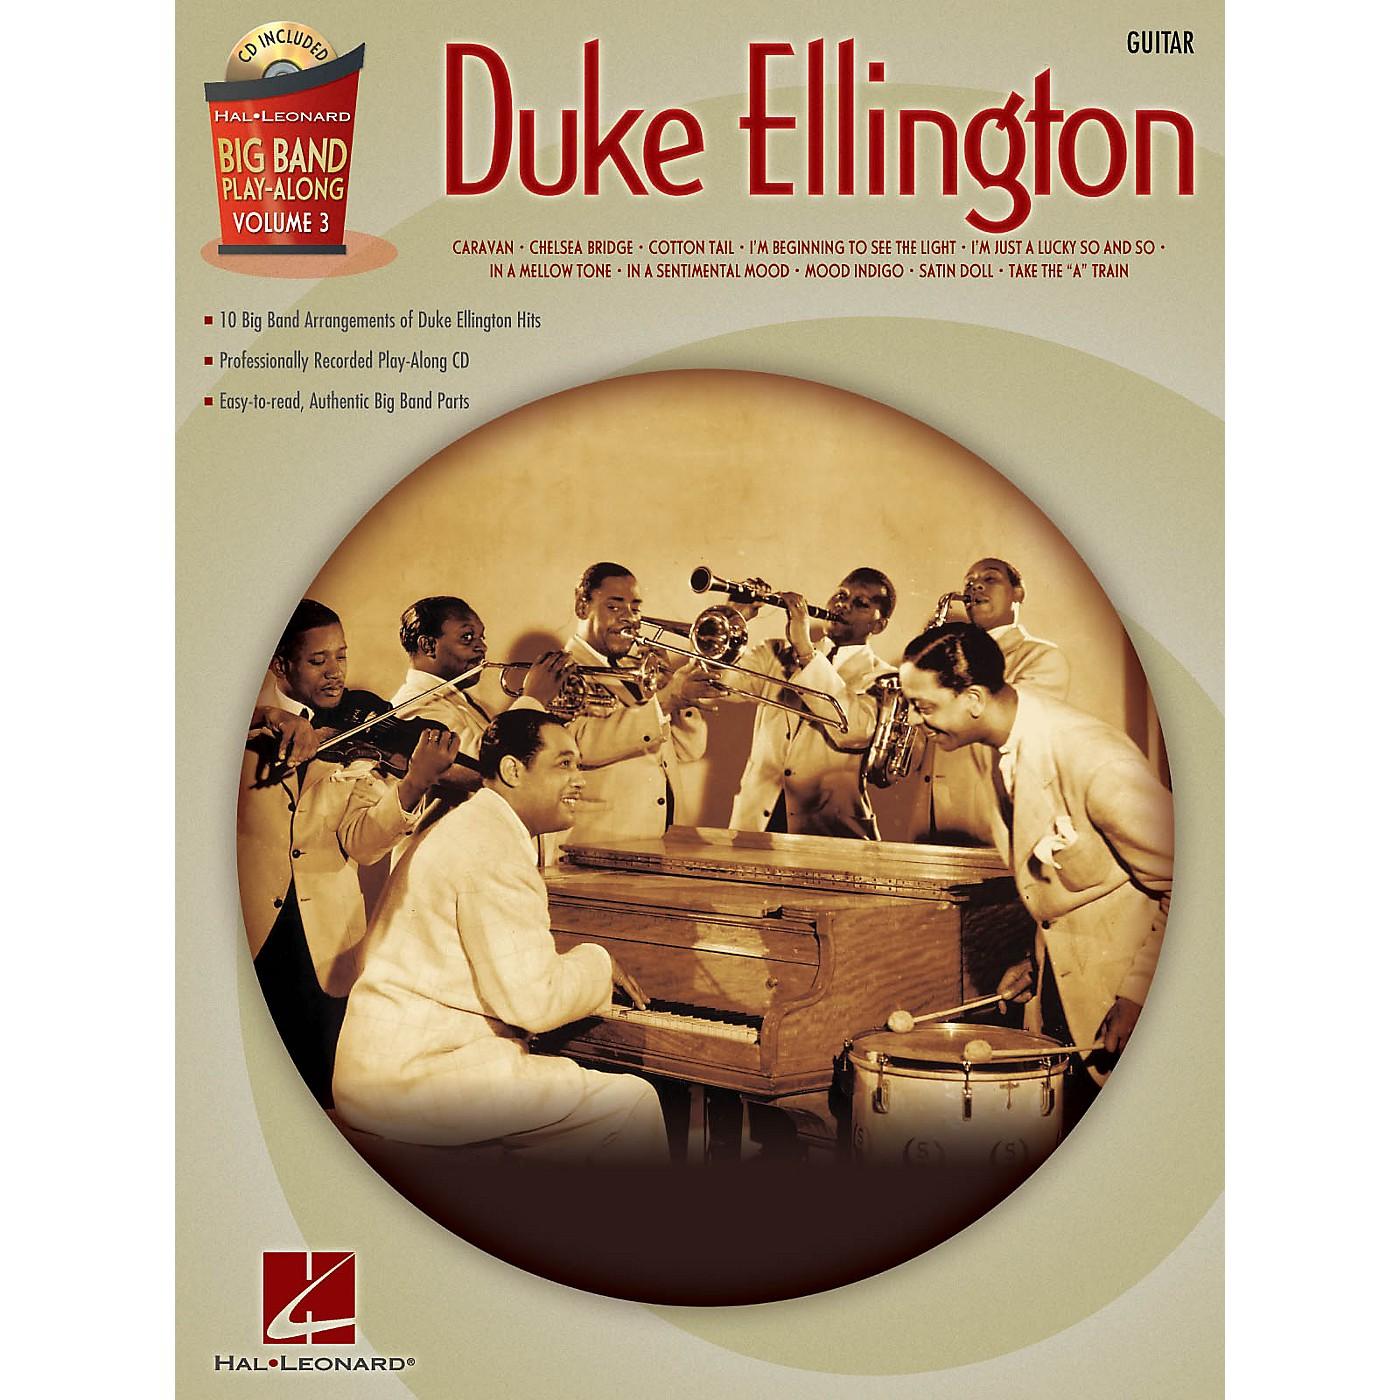 Hal Leonard Duke Ellington - Guitar (Big Band Play-Along Volume 3) Big Band Play-Along Series Softcover with CD thumbnail